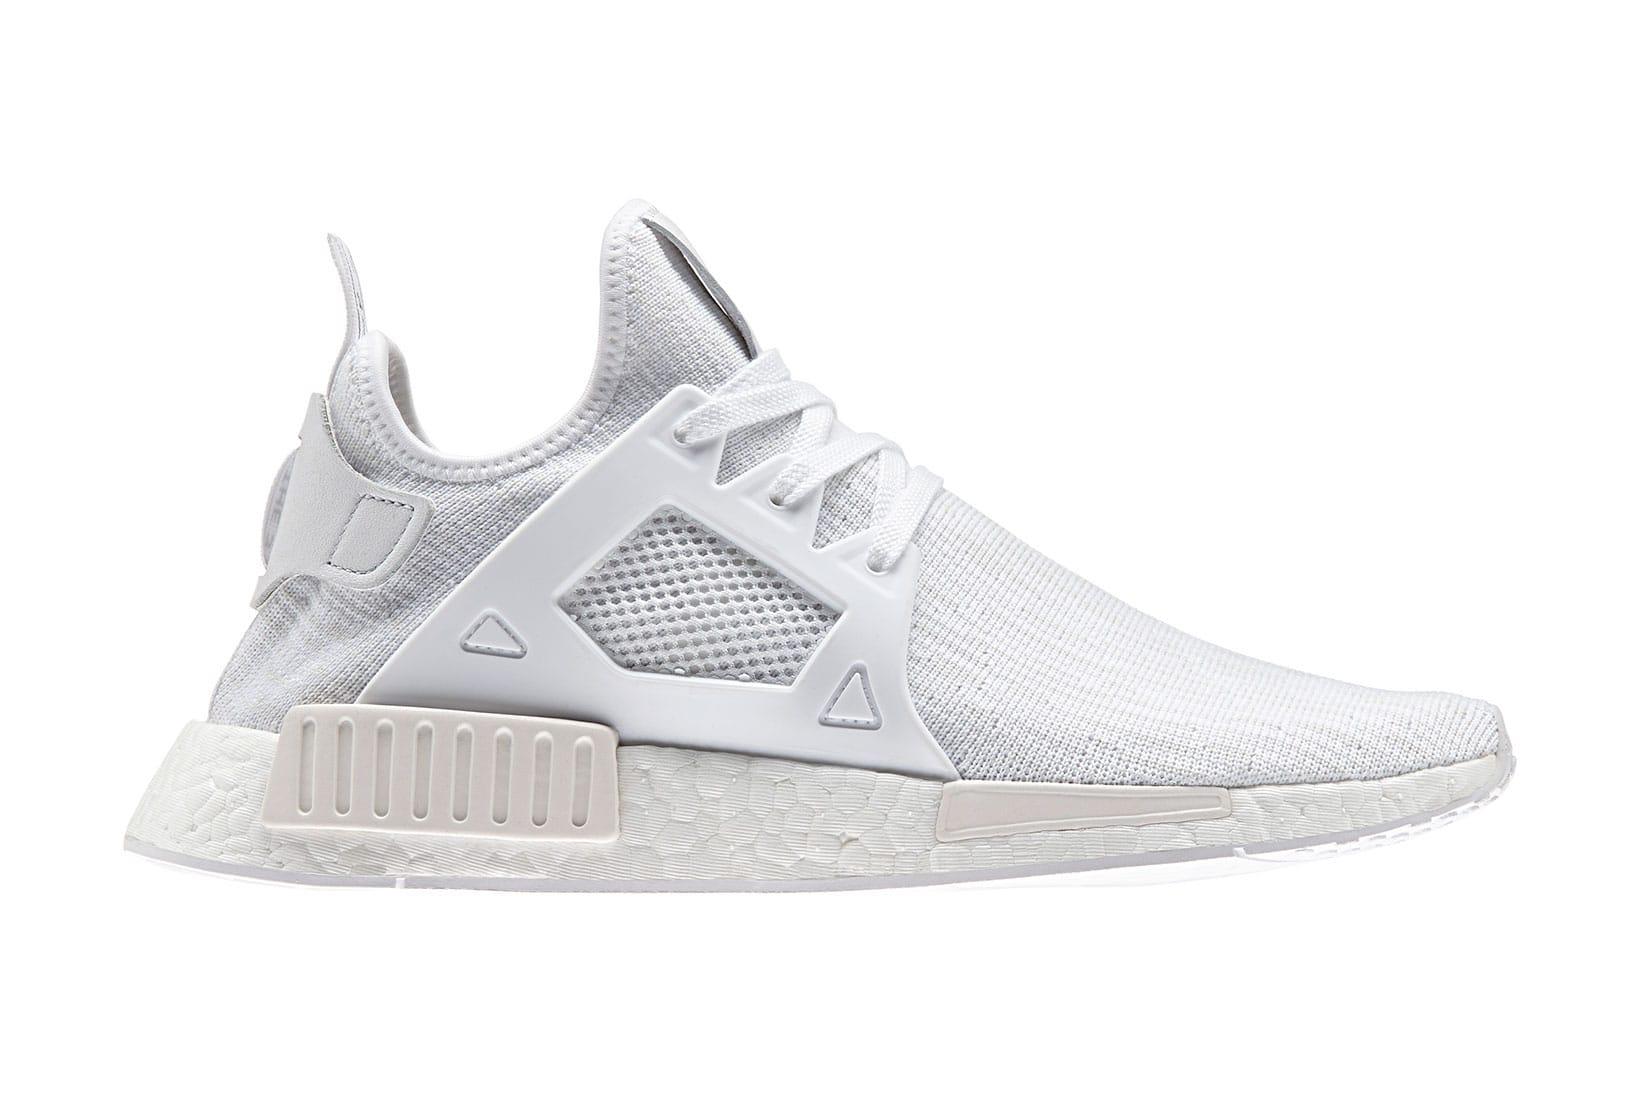 adidas Originals NMD XR1 White Sneaker